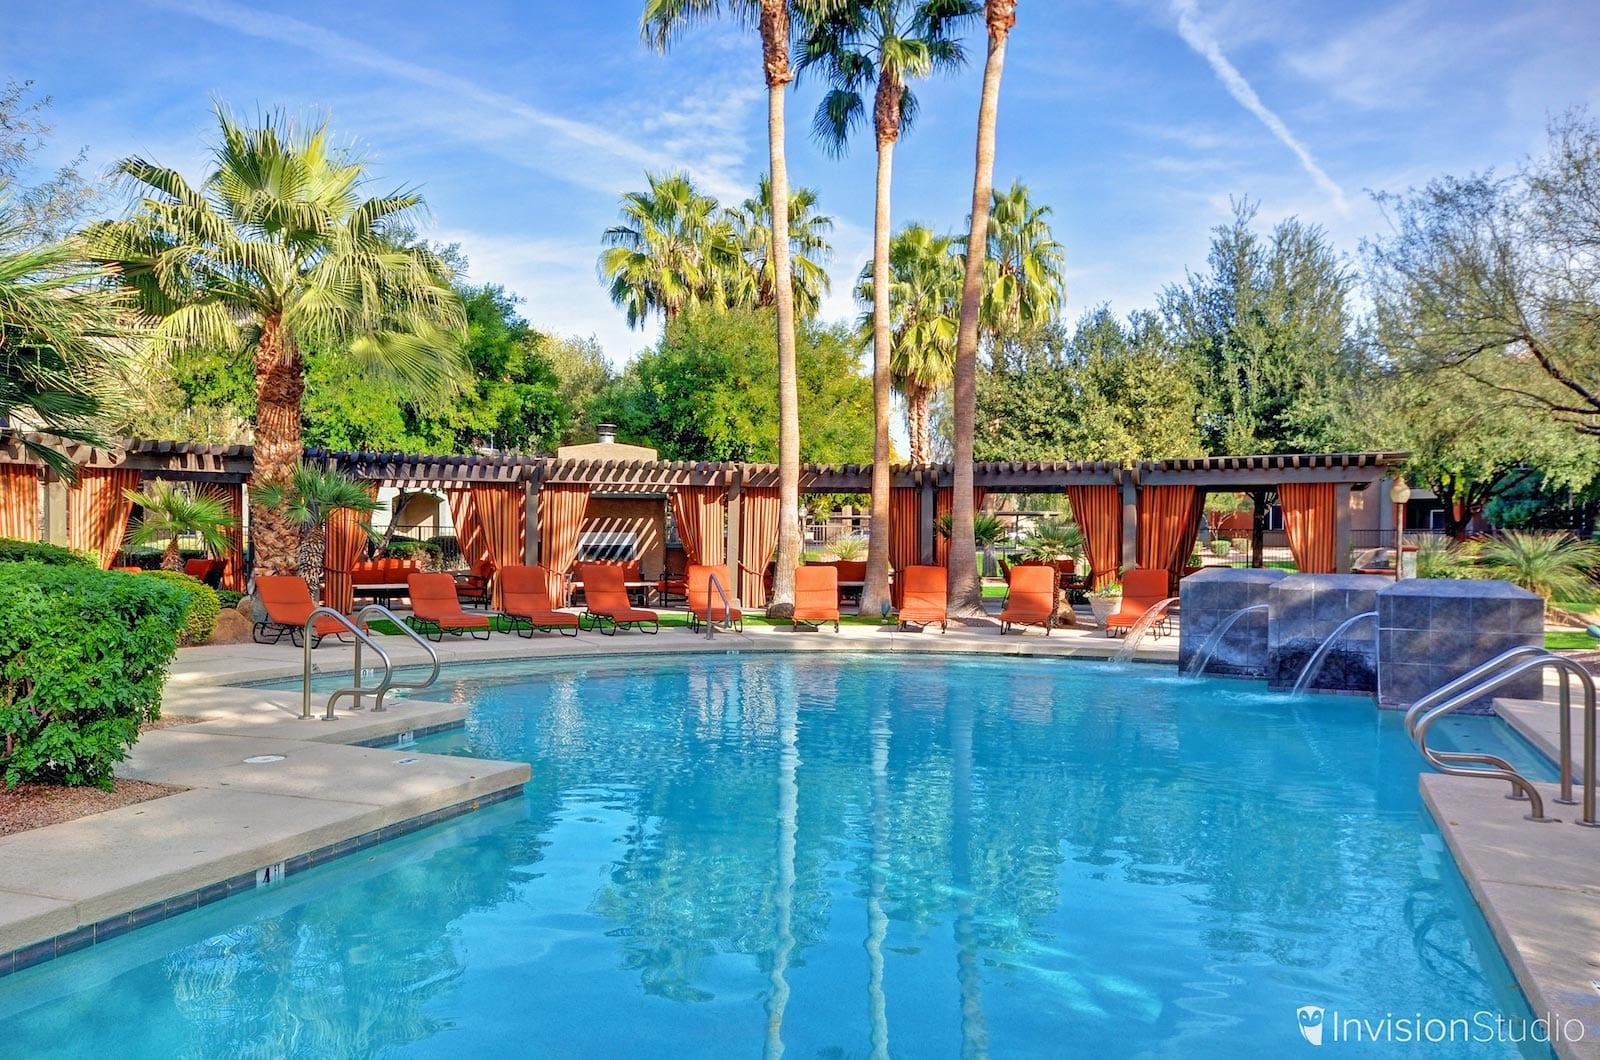 Las Vegas 360 Virtual Tours | Las Vegas Real Estate Aerial Photography Services | Las Vegas Property Photography Services | Las Vegas Matterport 3D Home Tours